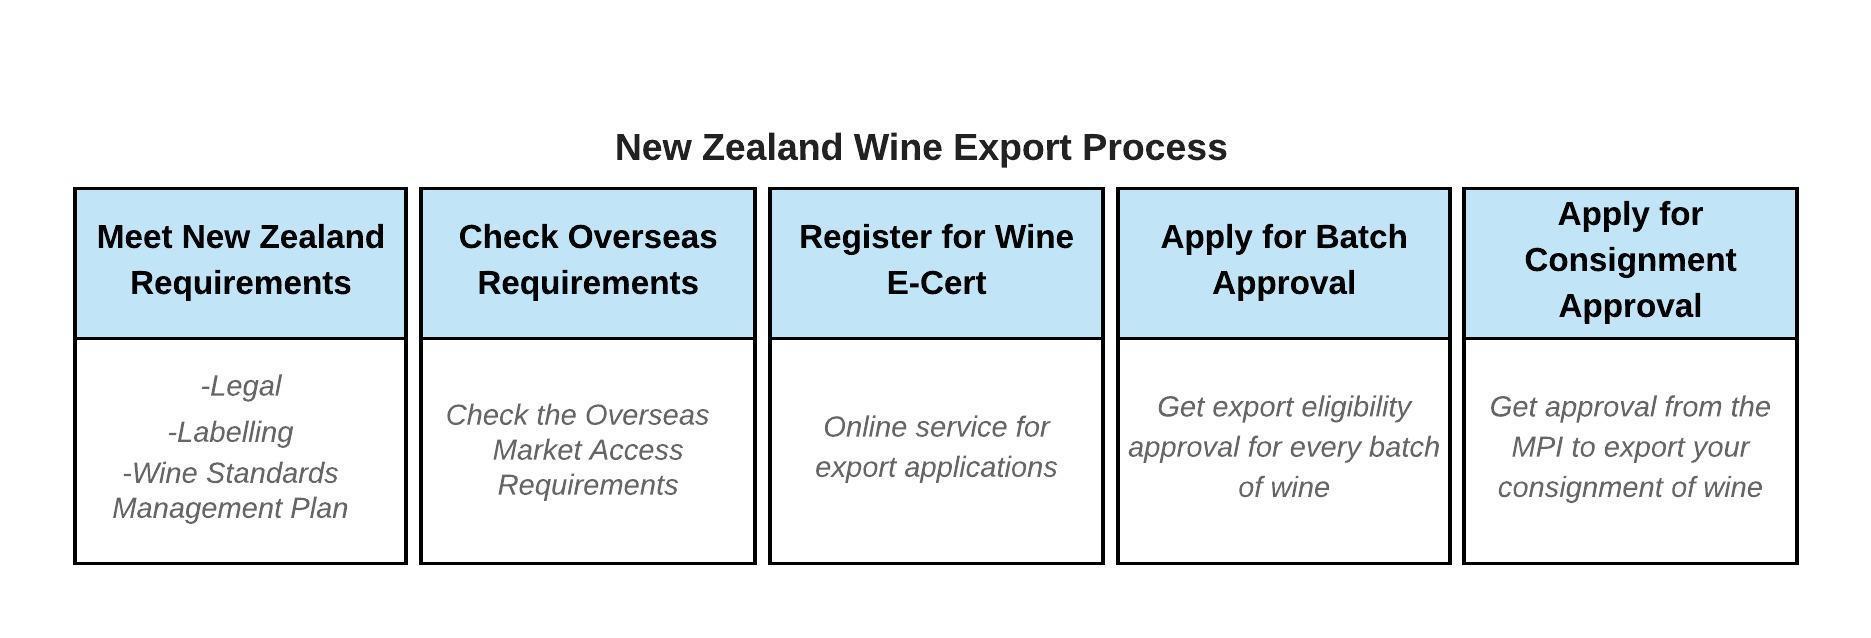 new zealand wine export pricess